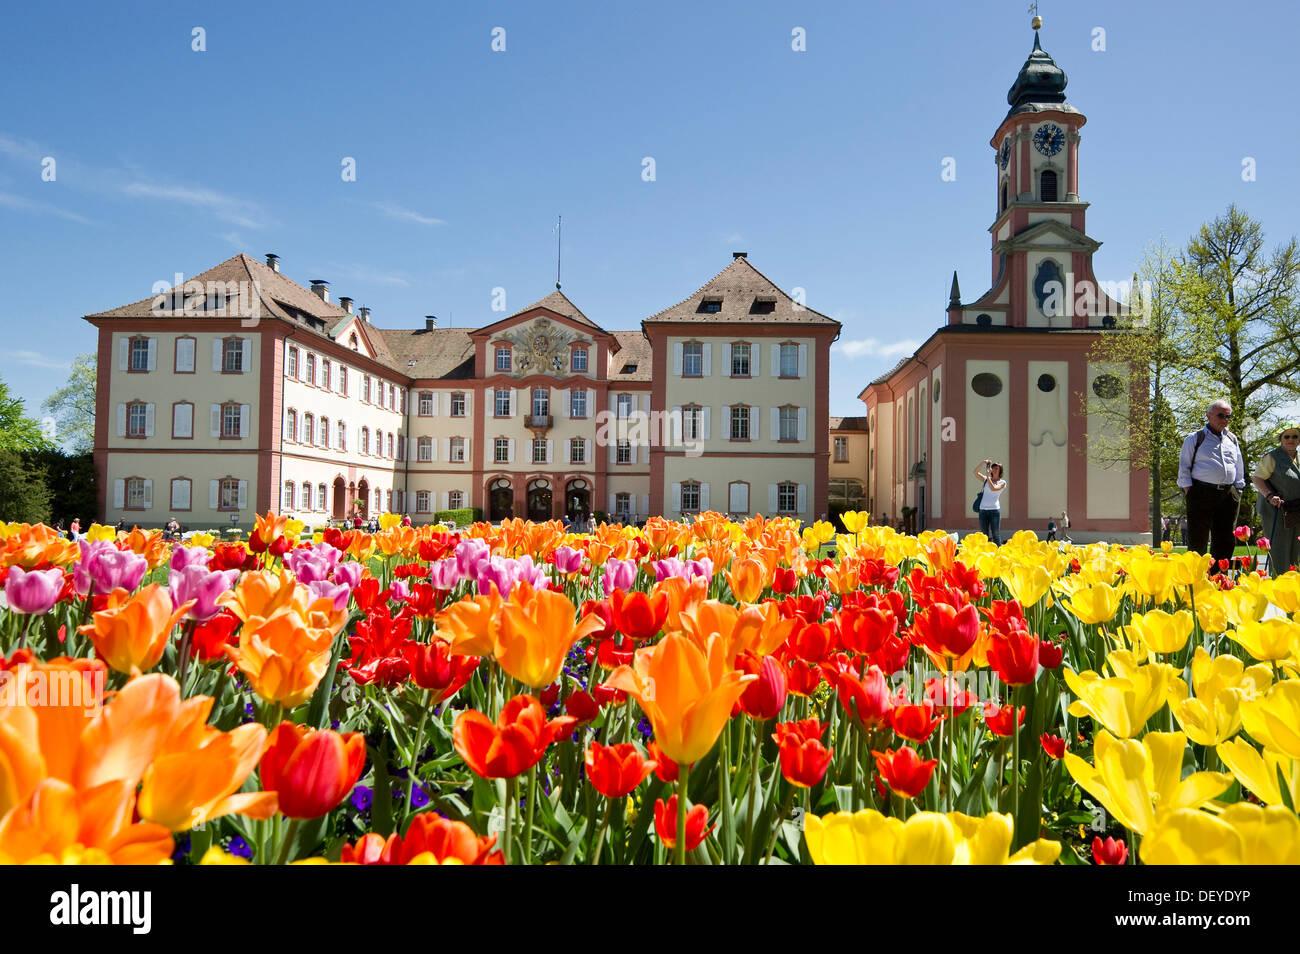 Schloss Mainau Castle and a colourful tulip field, Insel Mainau, Konstanz, Baden-Württemberg, Germany - Stock Image